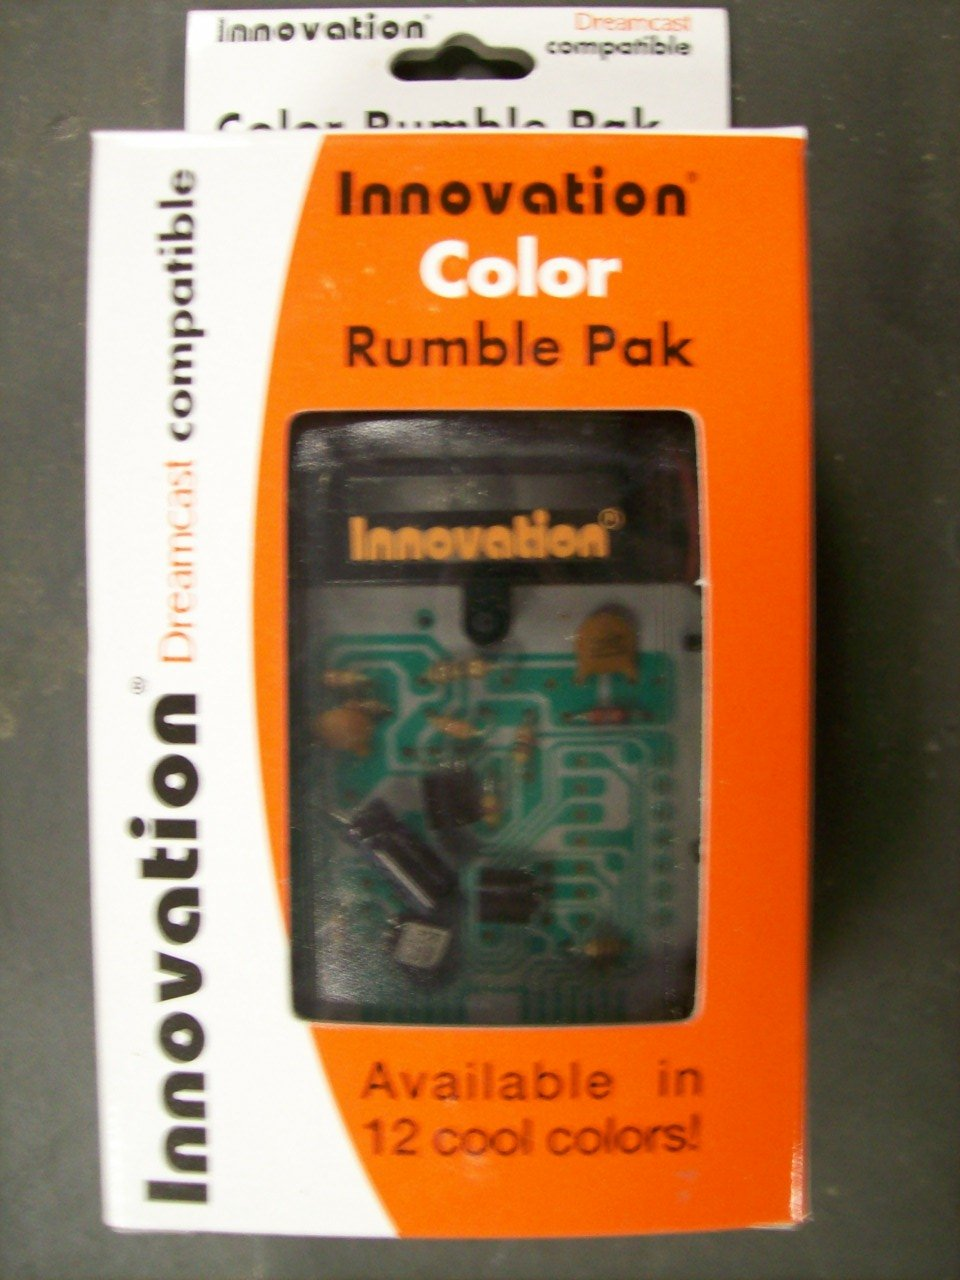 Sega Dreamcast Jump Pack: Video Games